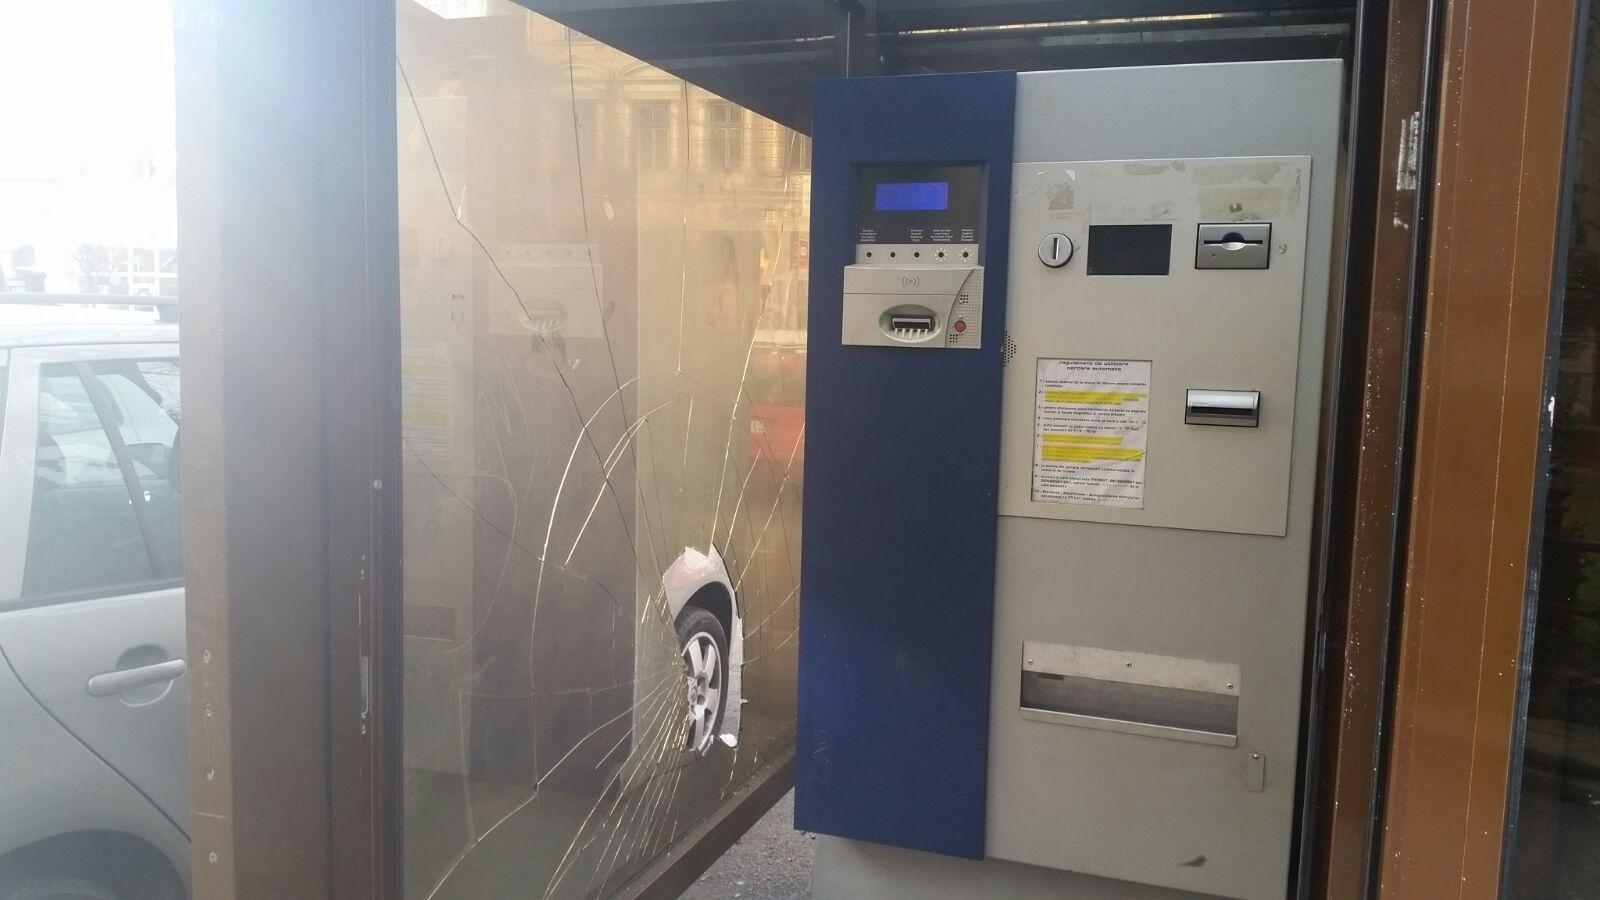 Au vandalizat stația de autobuz de pe strada Unirii - FOTO